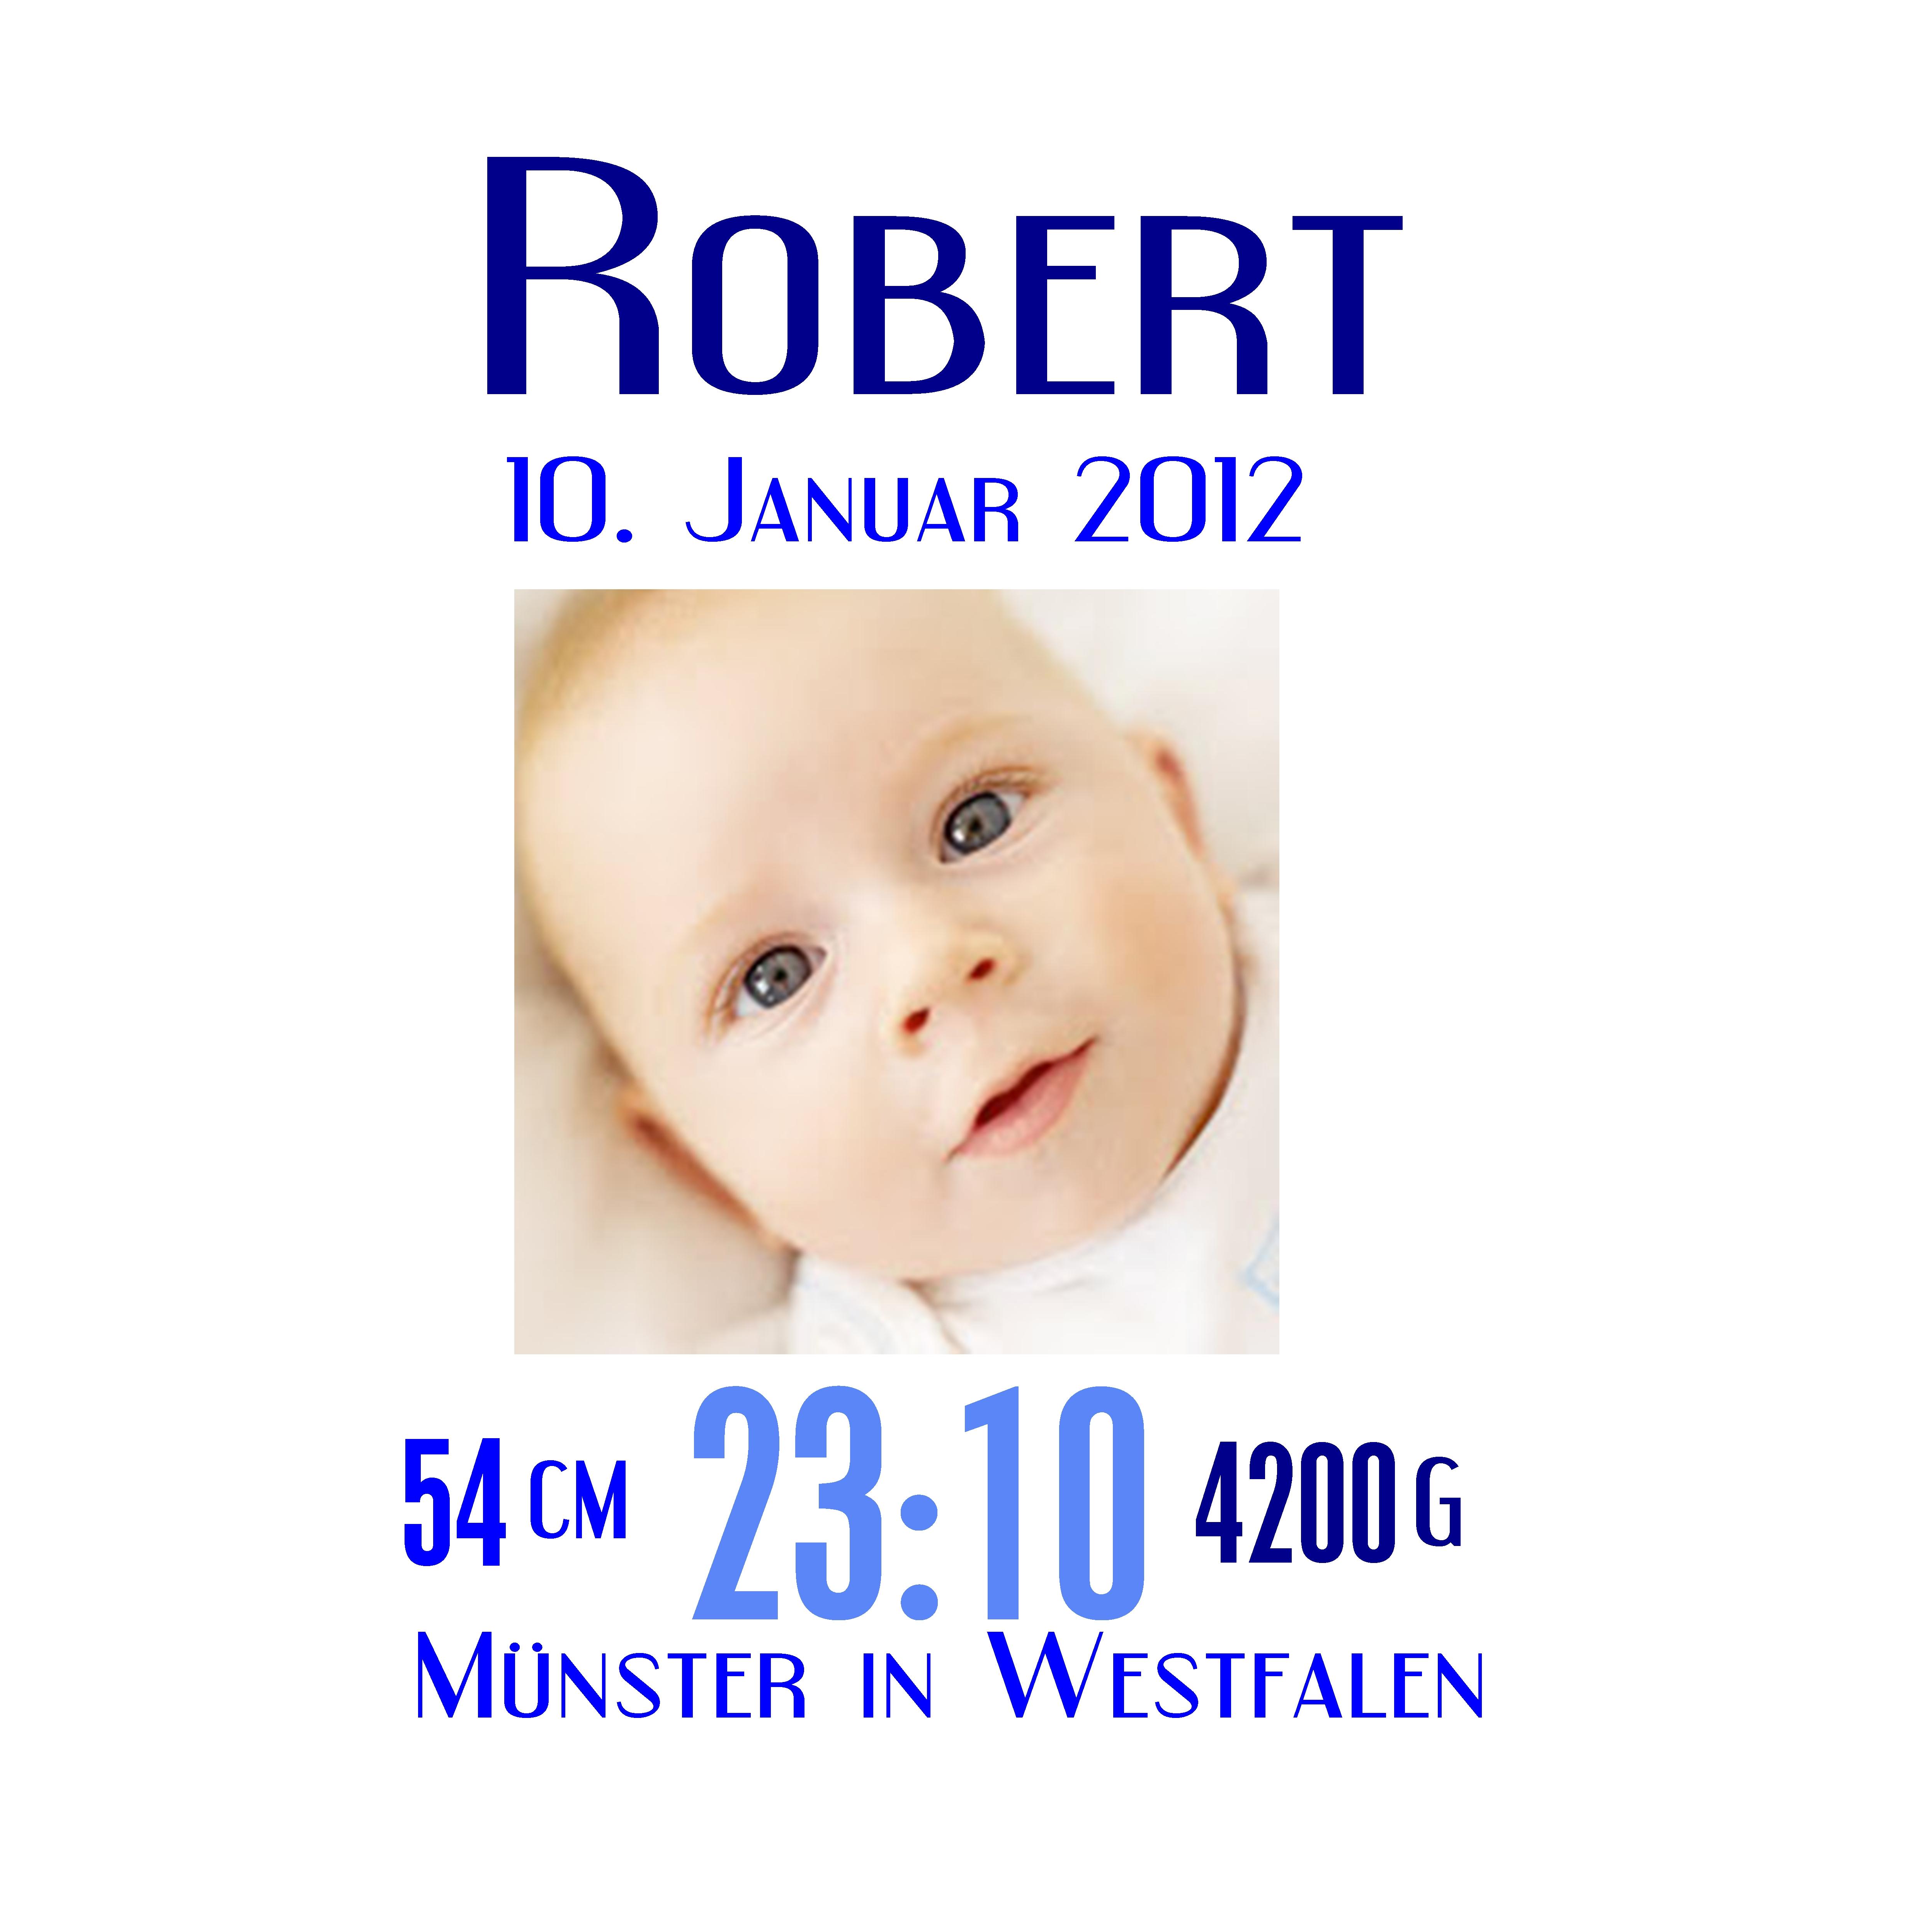 Muster Geburt Robert